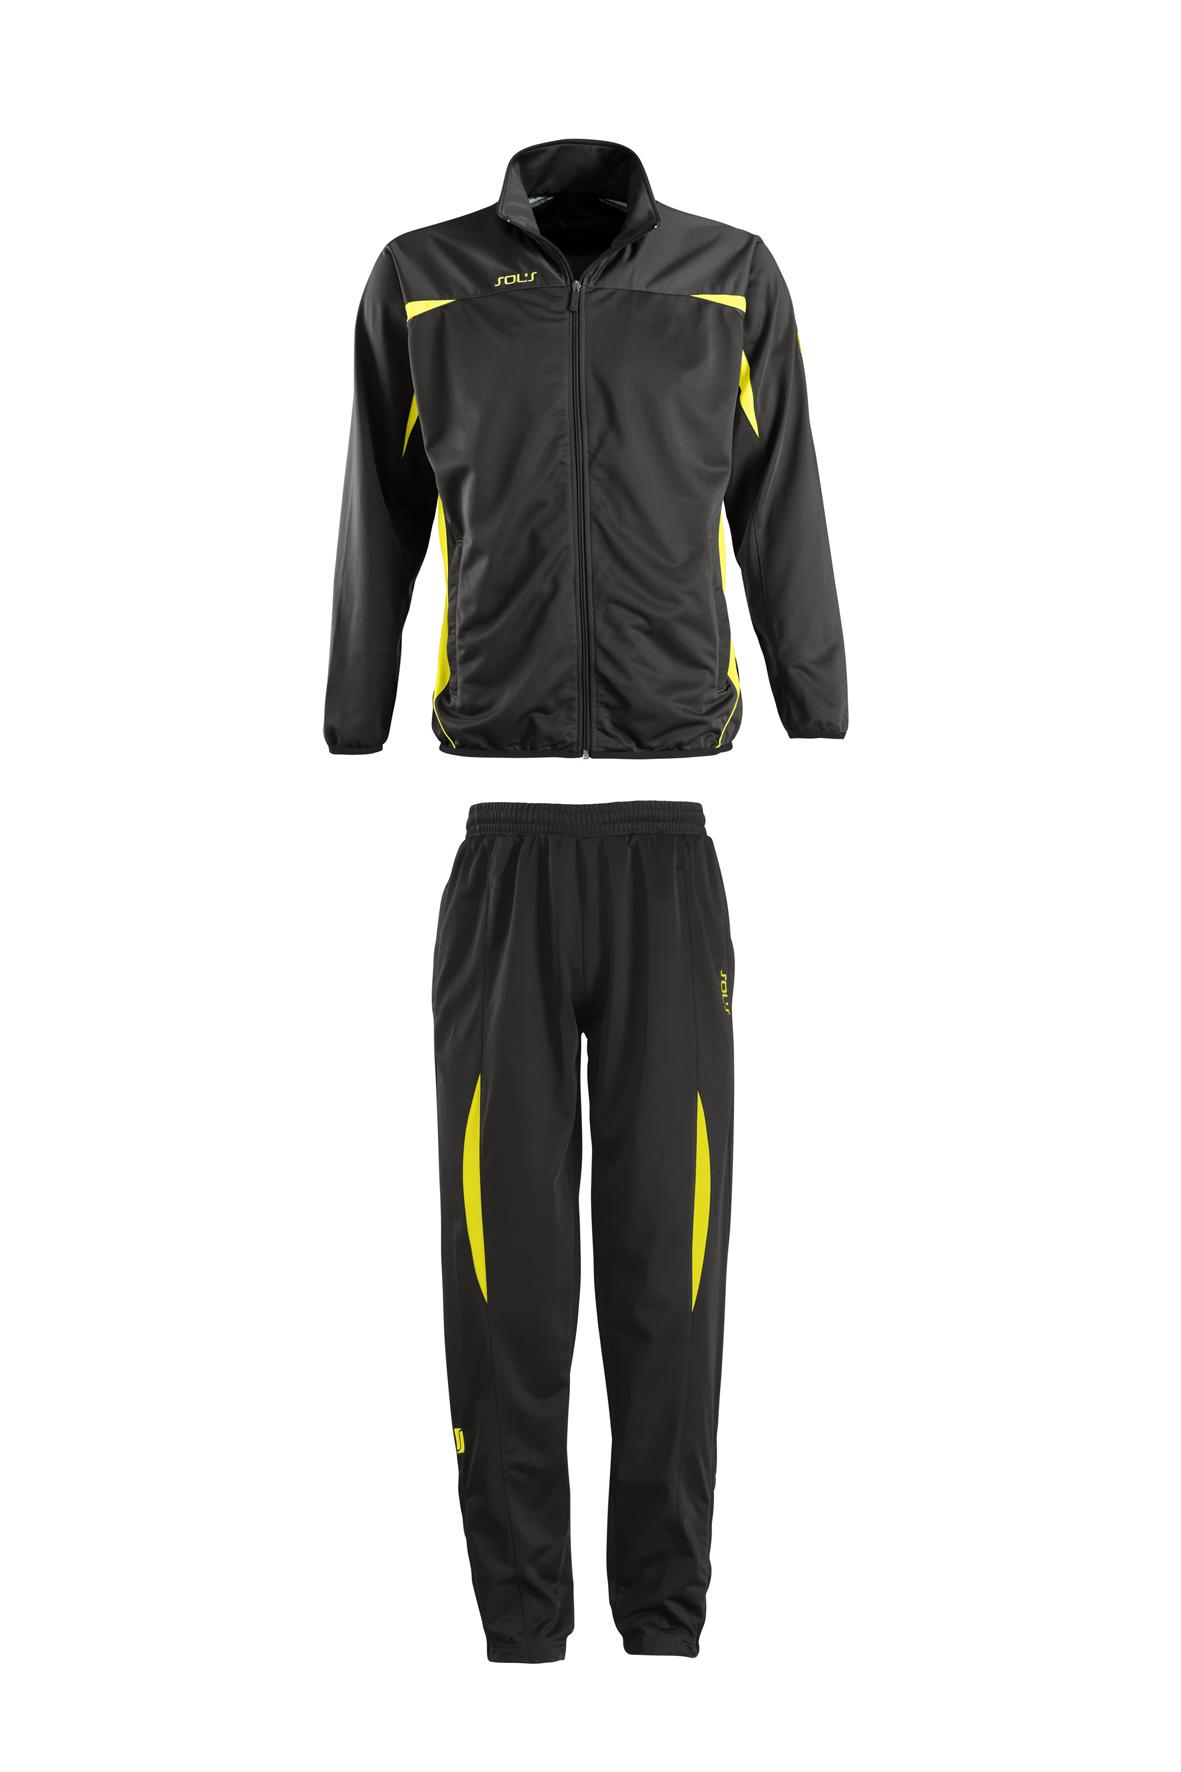 Camp Nou - Black/Lemon/Black - S